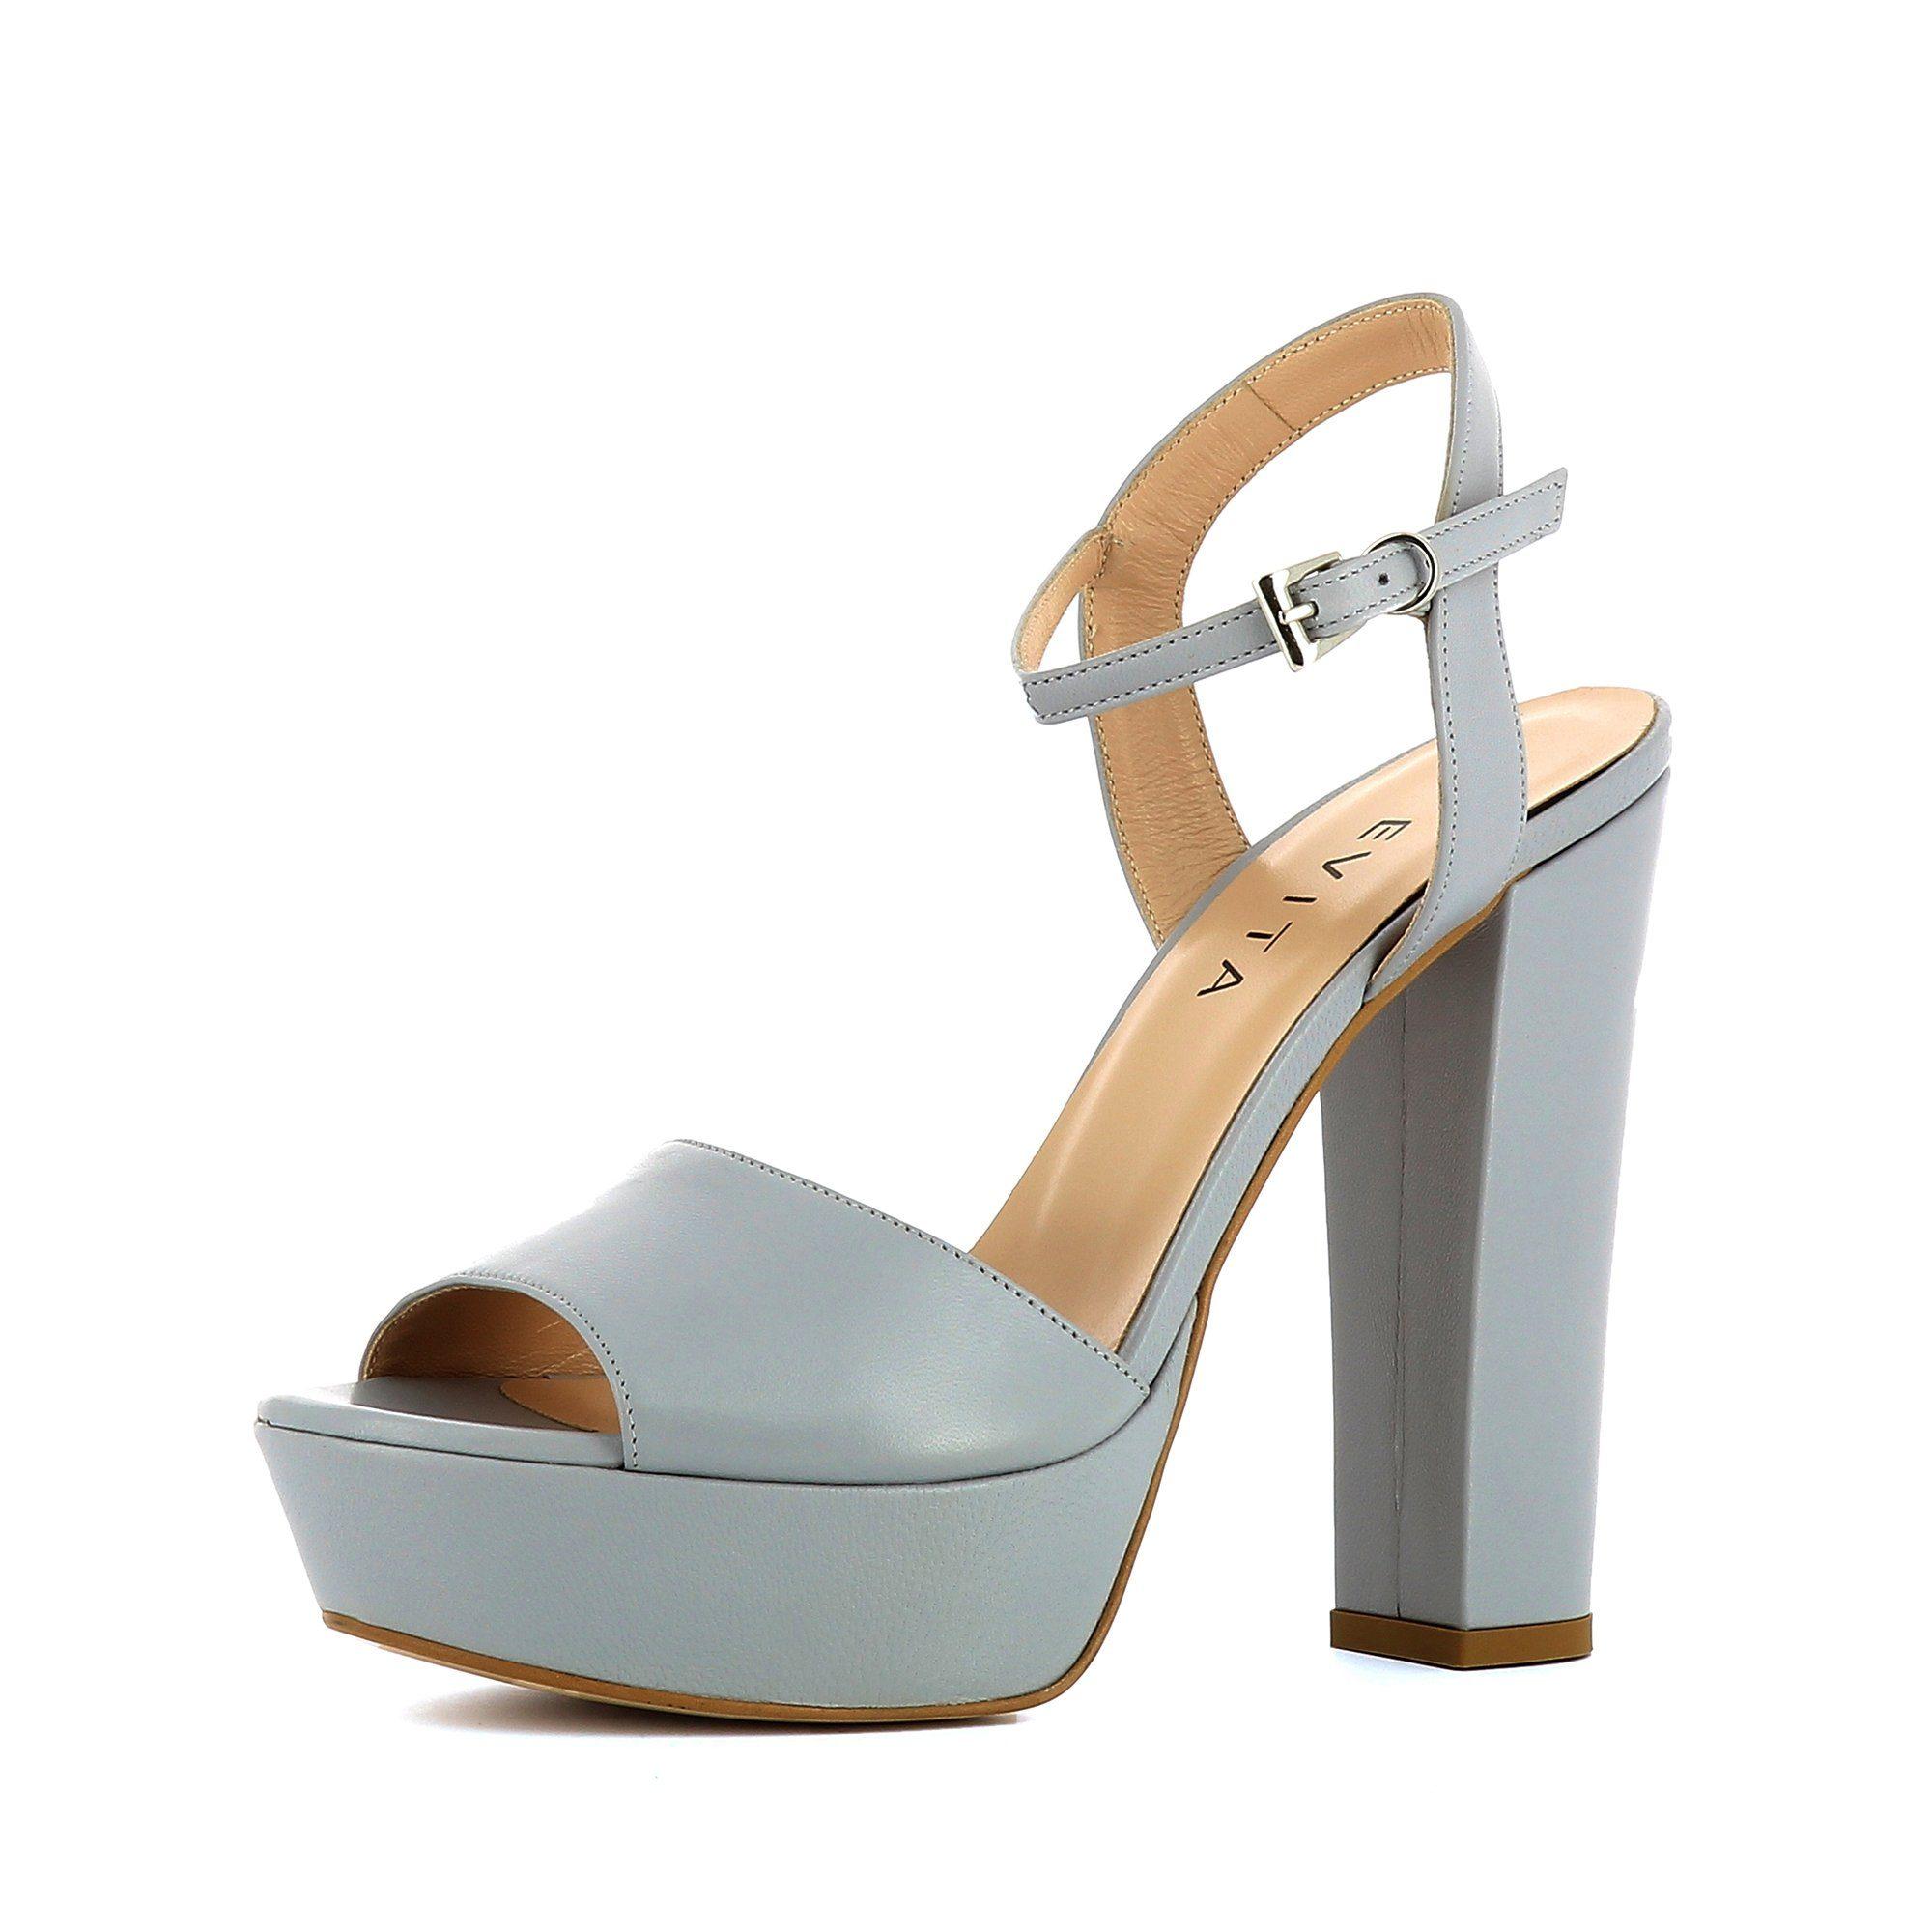 Evita STEFANIA High-Heel-Sandalette, Plateausandaletten online kaufen  hellgrau